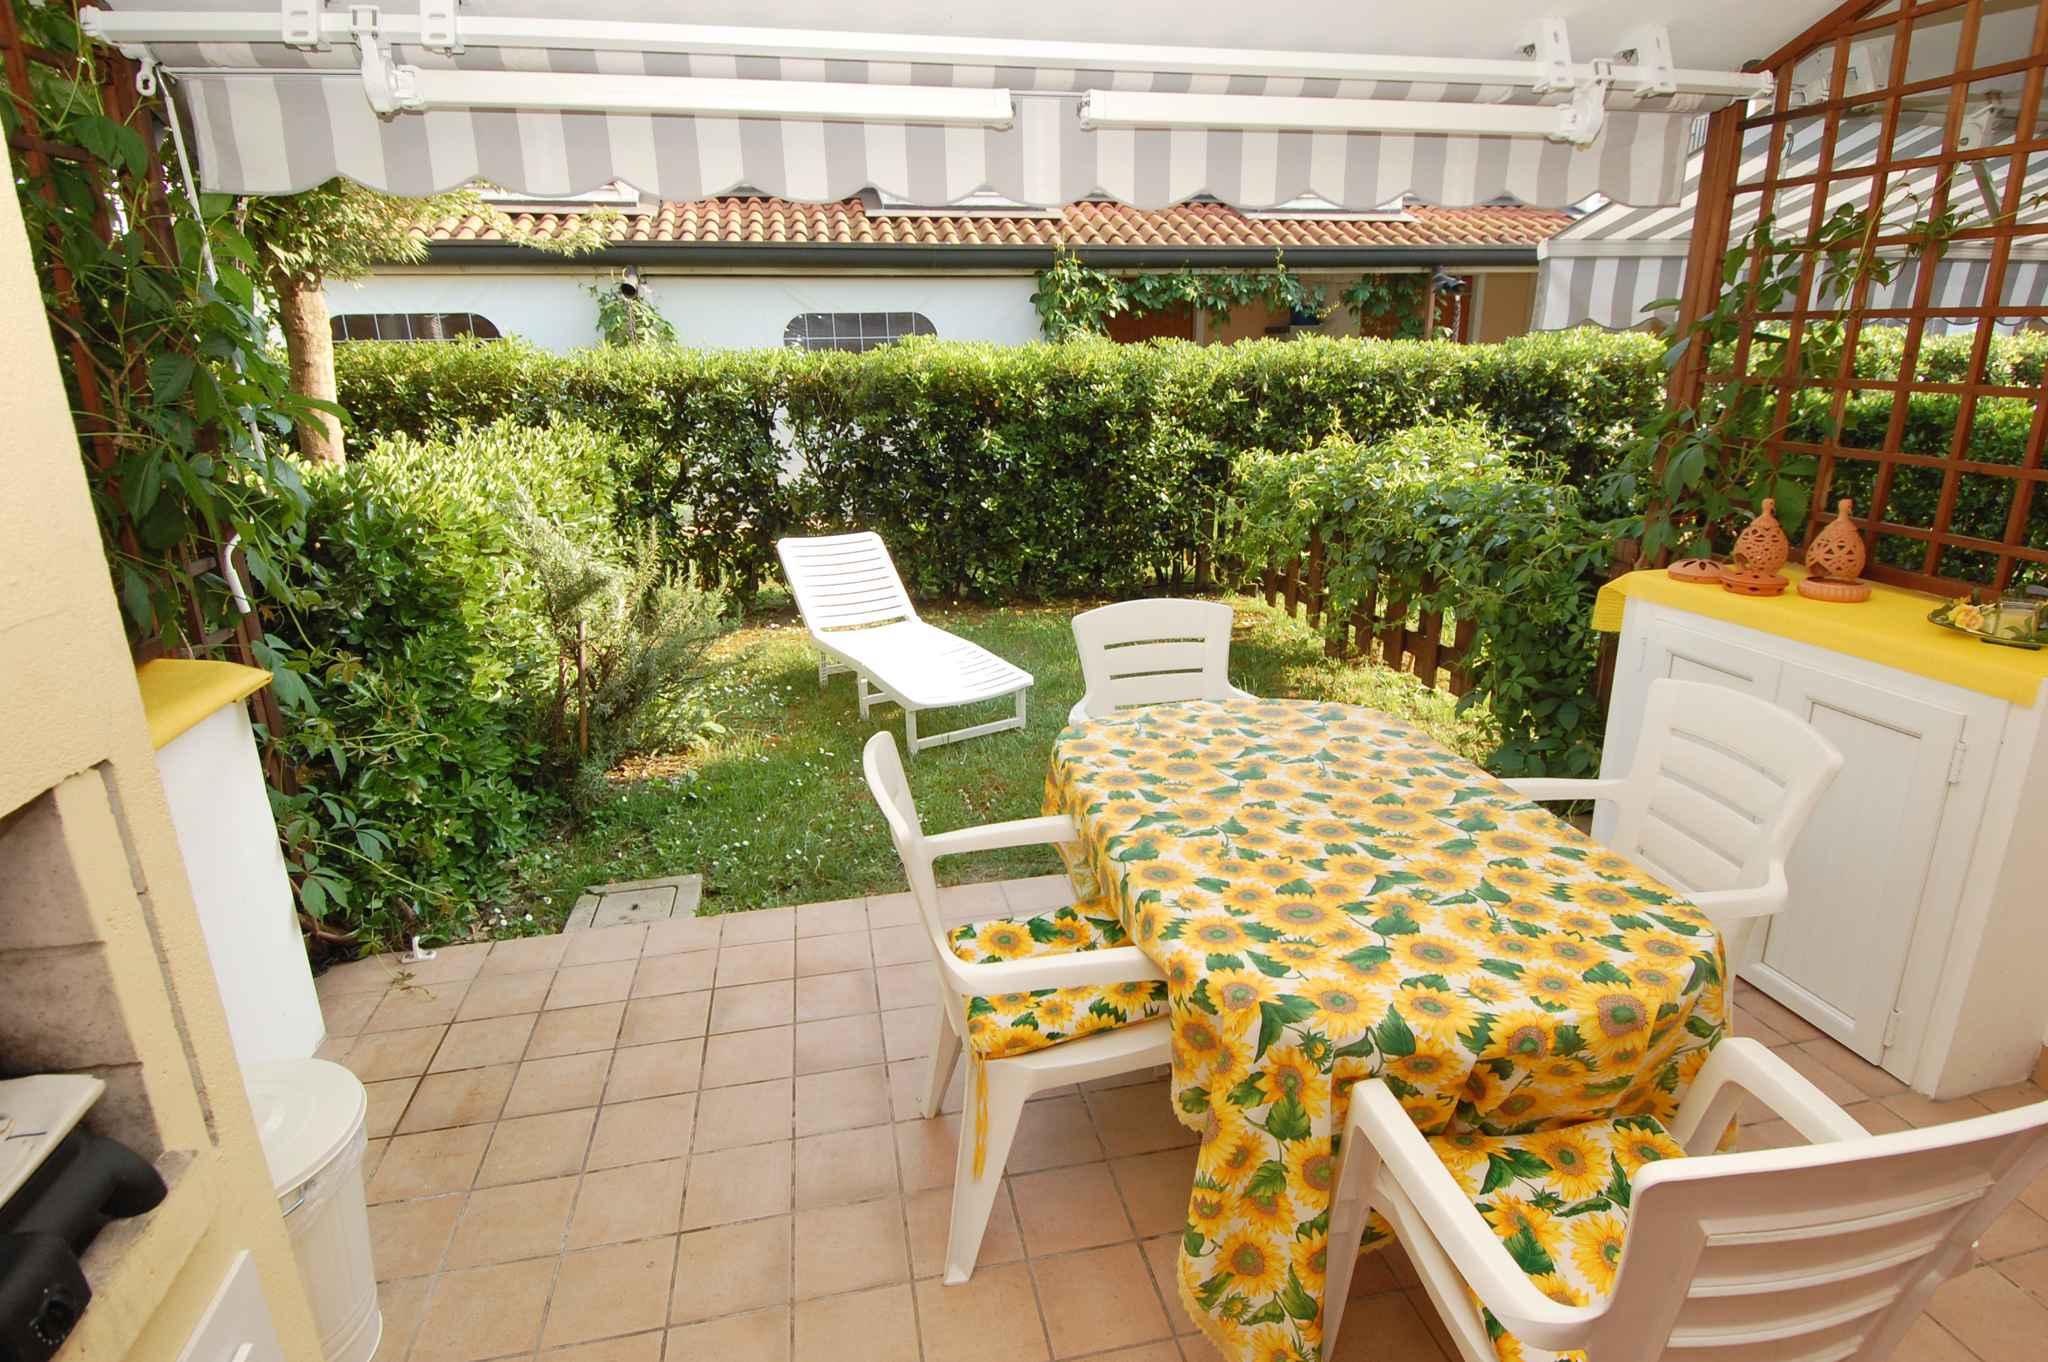 Ferienhaus mit Pool und Grill (284304), Rosolina Mare, Rovigo, Venetien, Italien, Bild 6